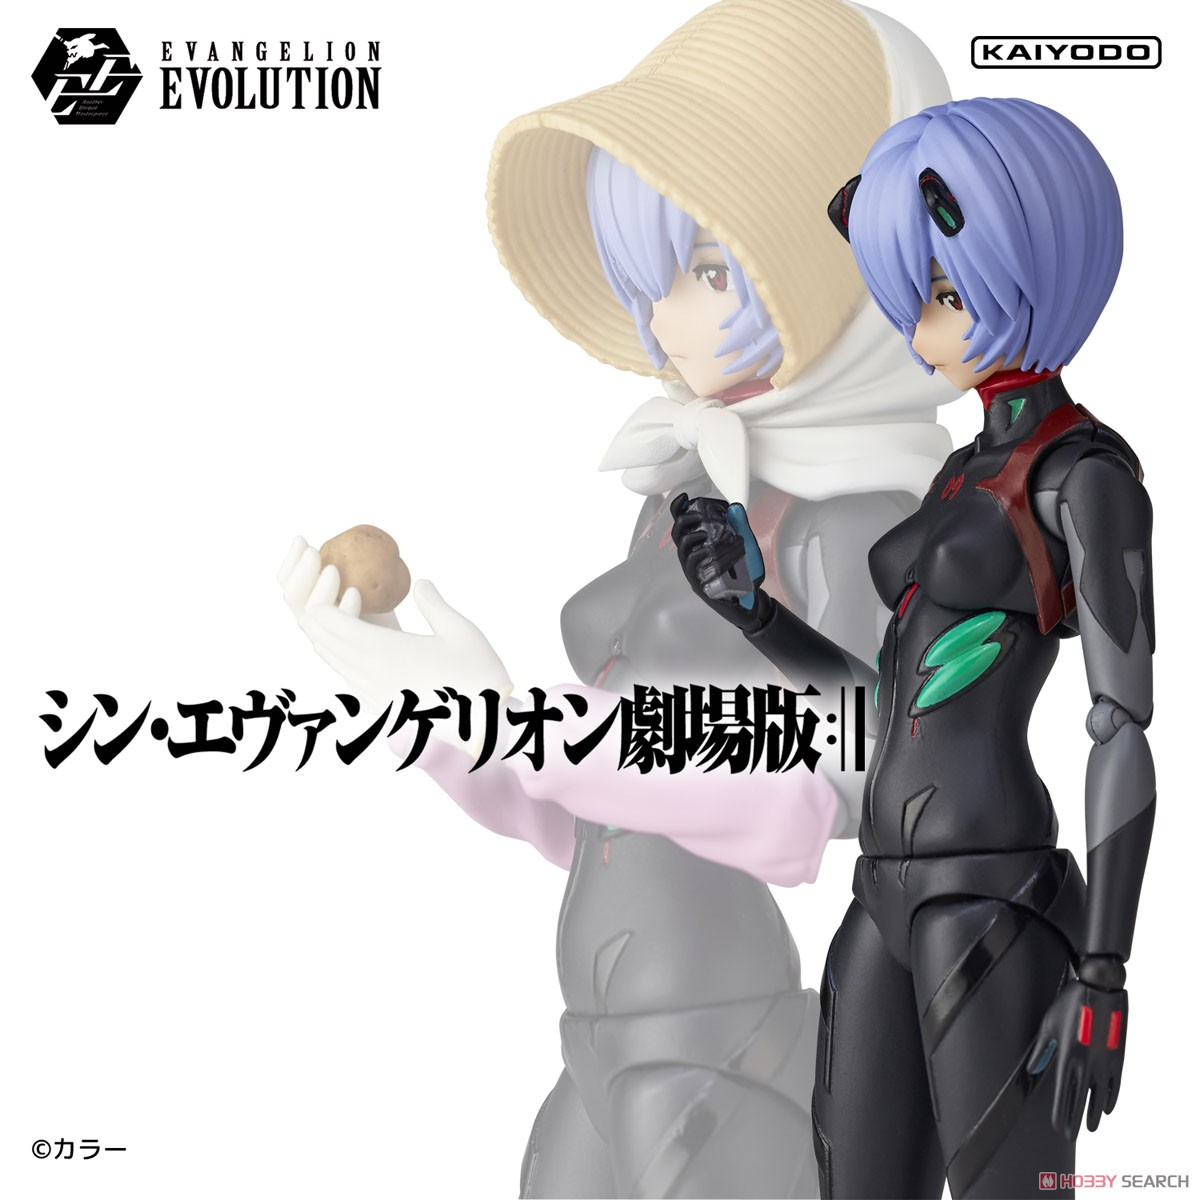 EVANGELION EVOLUTION EV-022『アヤナミレイ(仮称)第3村Ver.』シン・エヴァンゲリオン劇場版 可動フィギュア-017